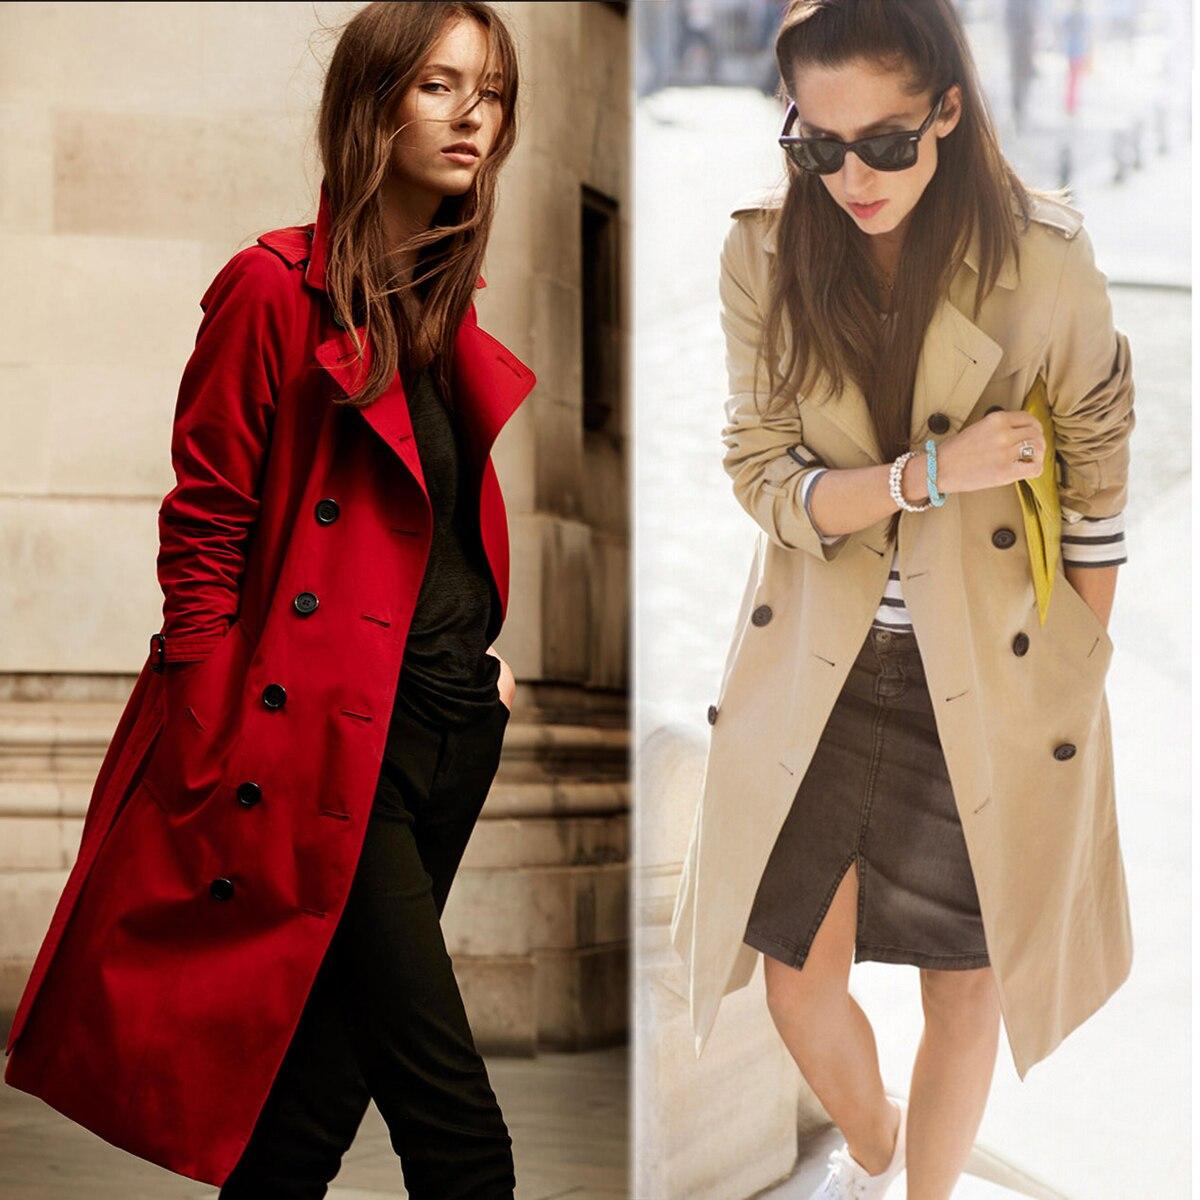 JAZZEVAR 2019 الخريف الجديدة عالية أزياء العلامة التجارية امرأة الكلاسيكية مزدوجة الصدر خندق معطف المطر ماء الأعمال قميص-في معطف مبطن من ملابس نسائية على  مجموعة 3